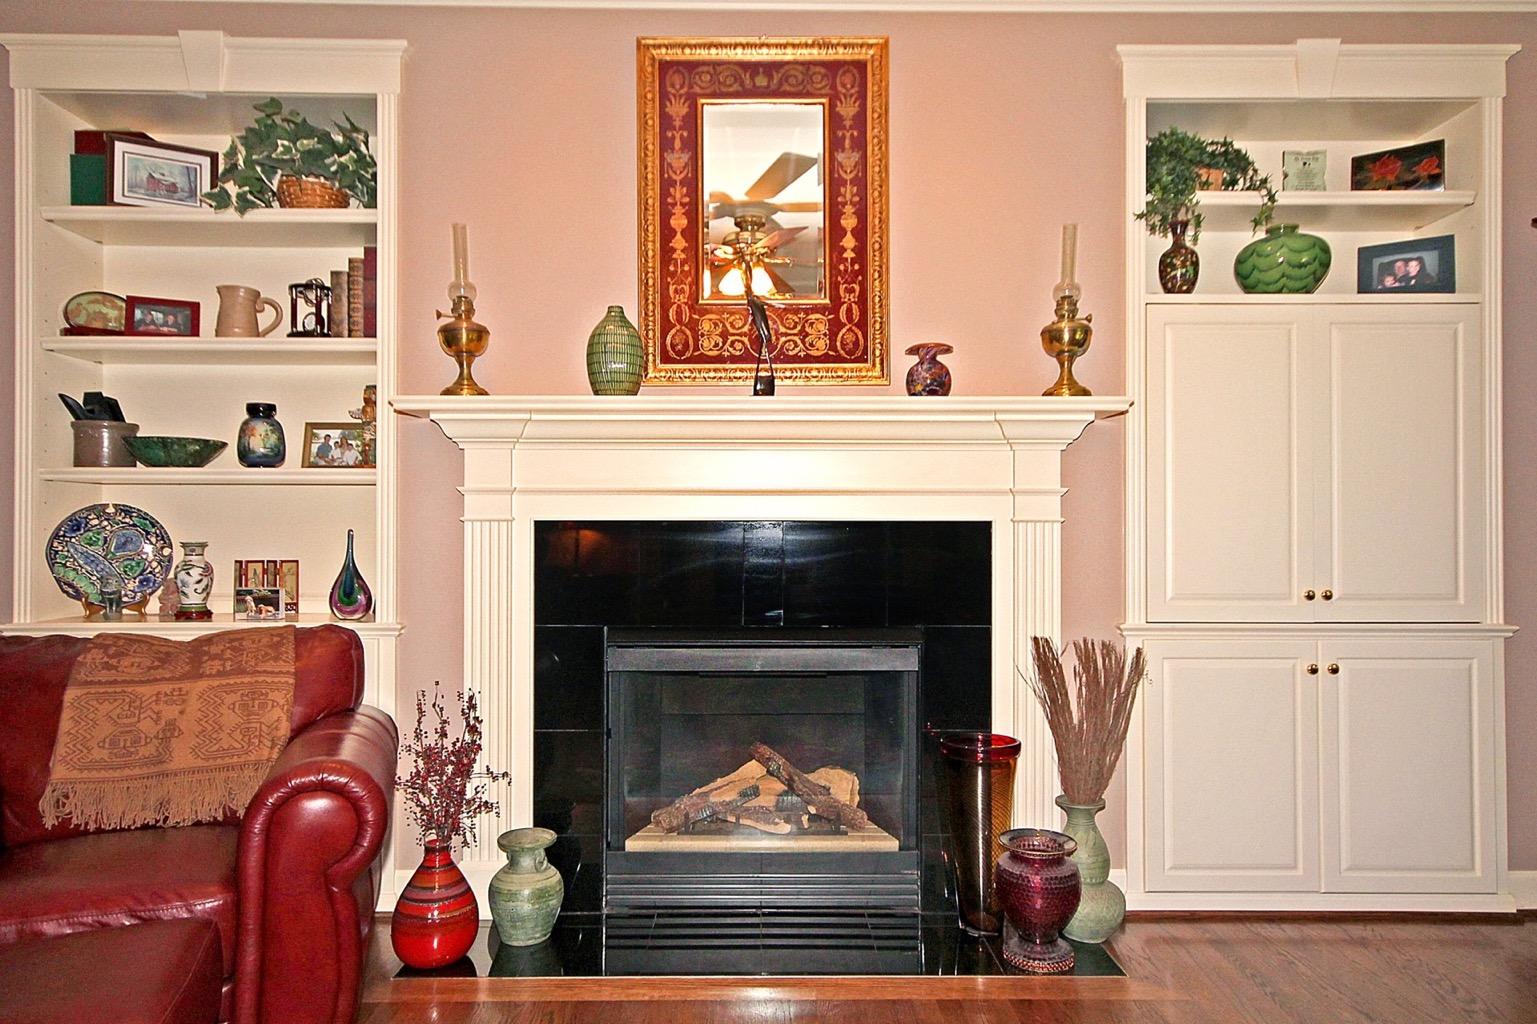 fireplace_edit.jpg